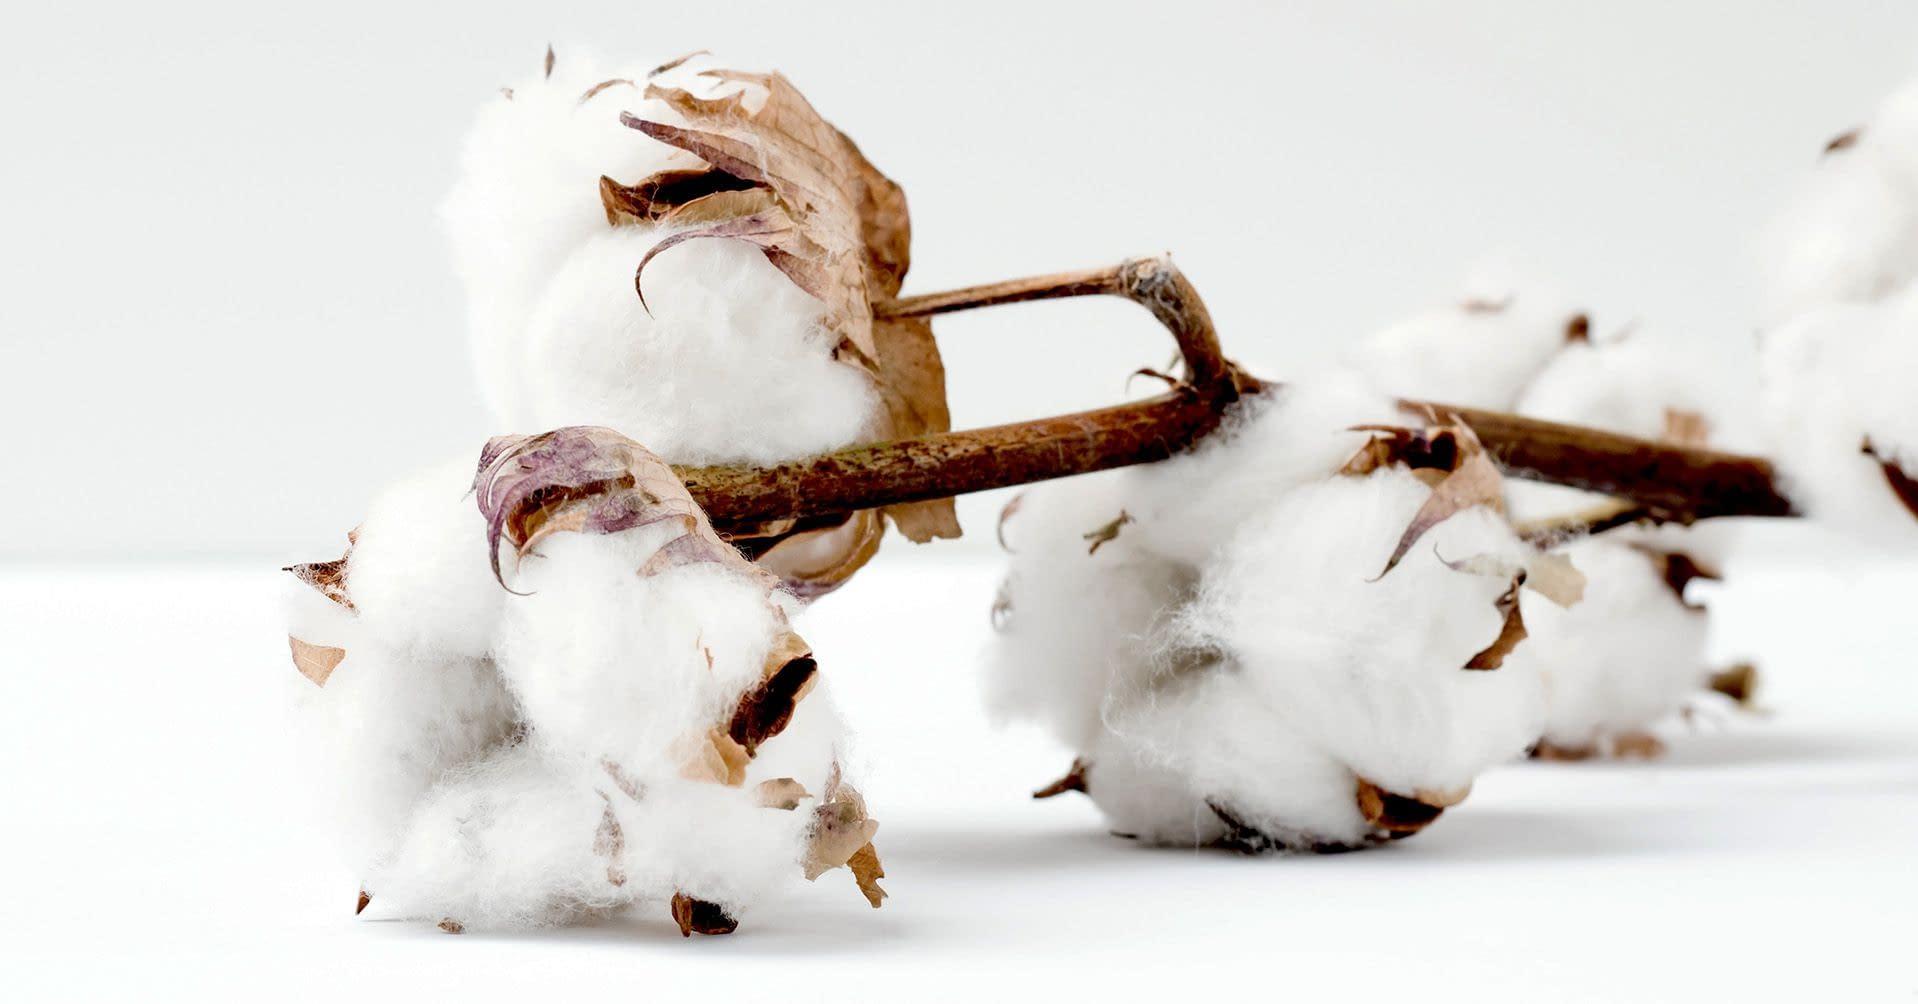 planta de algodón telas Bogotá